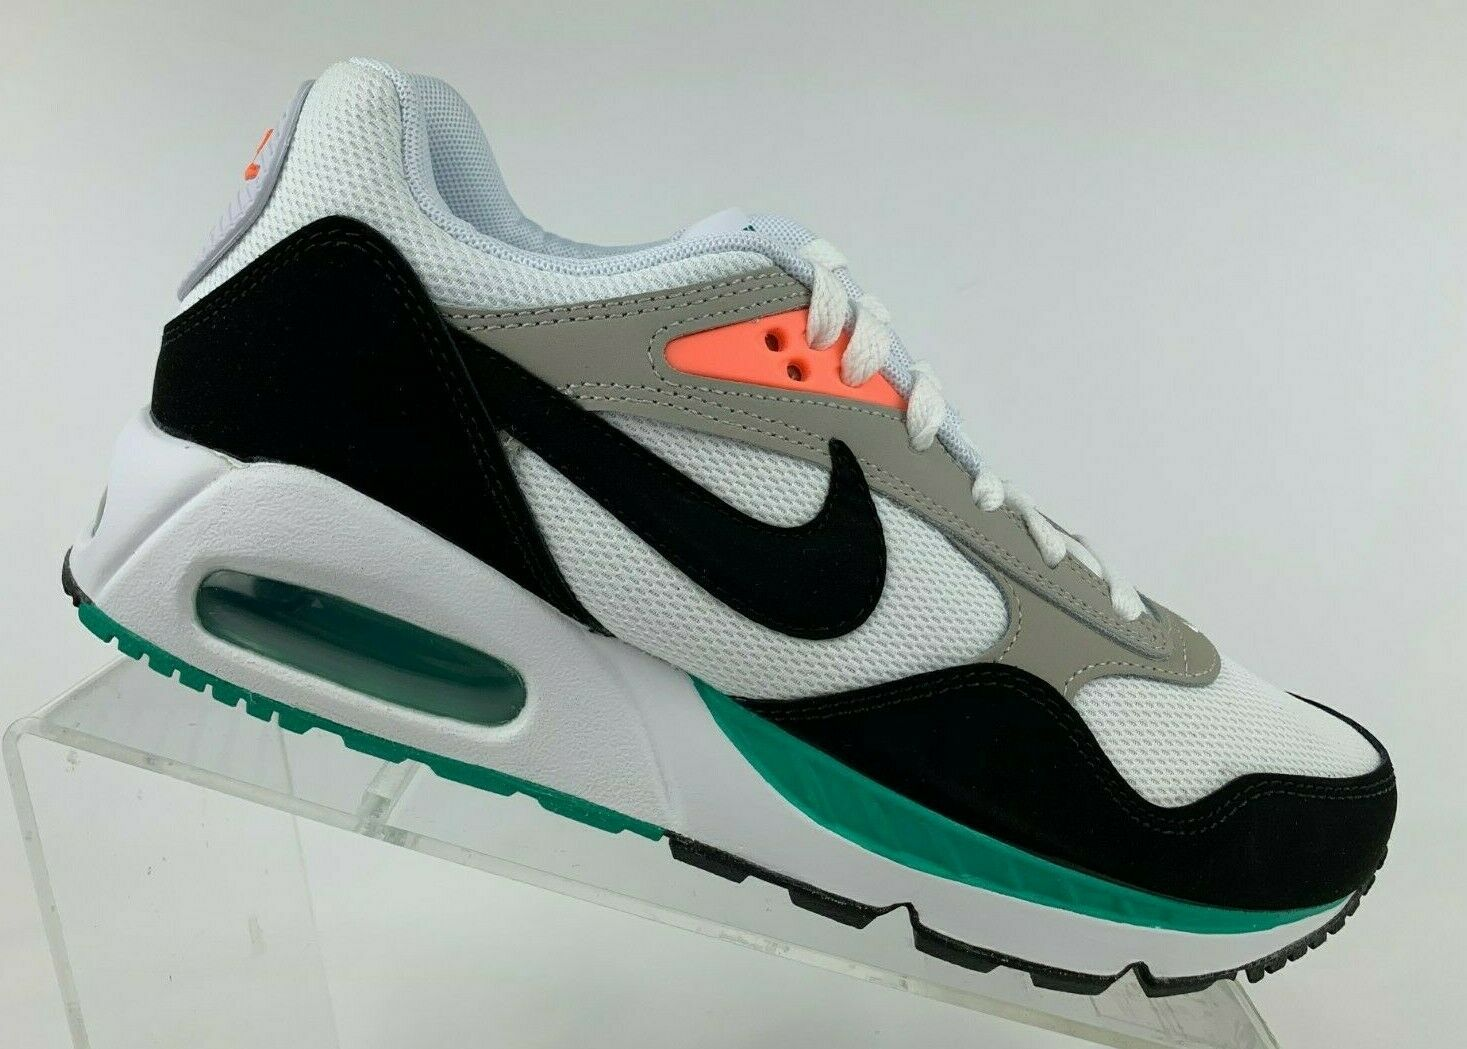 Nike Air Max Correlate Women's Sneakers